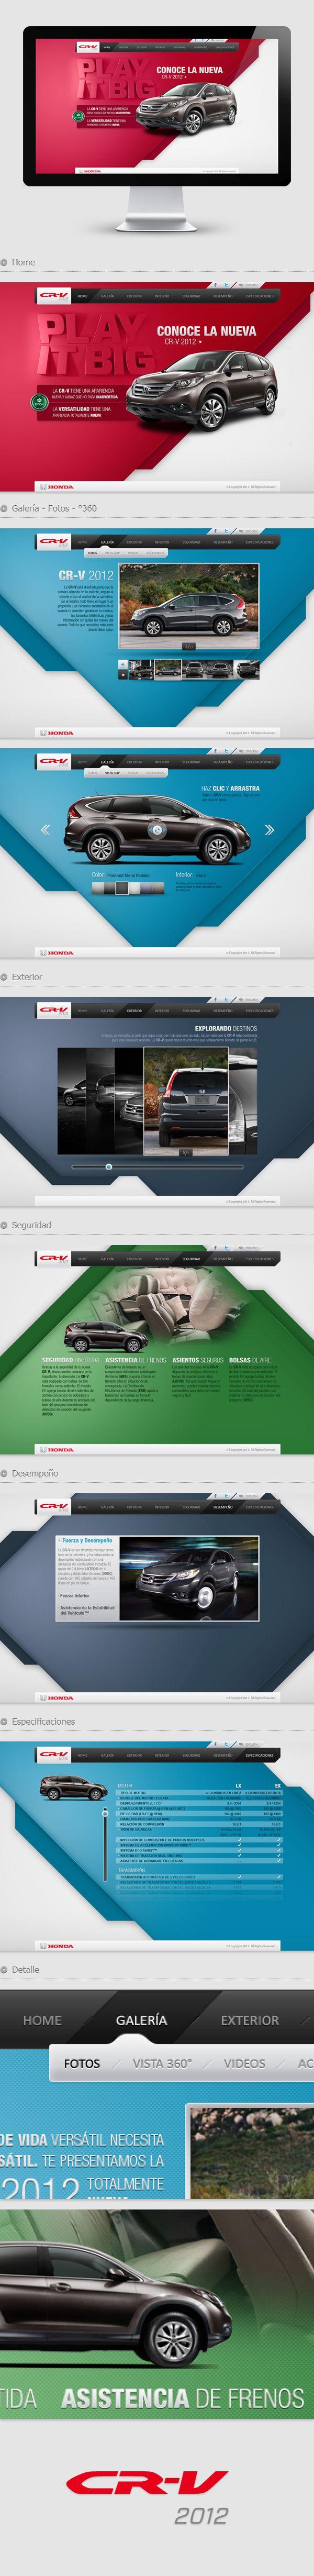 CR - V 2012 - Honda on Web Design Served